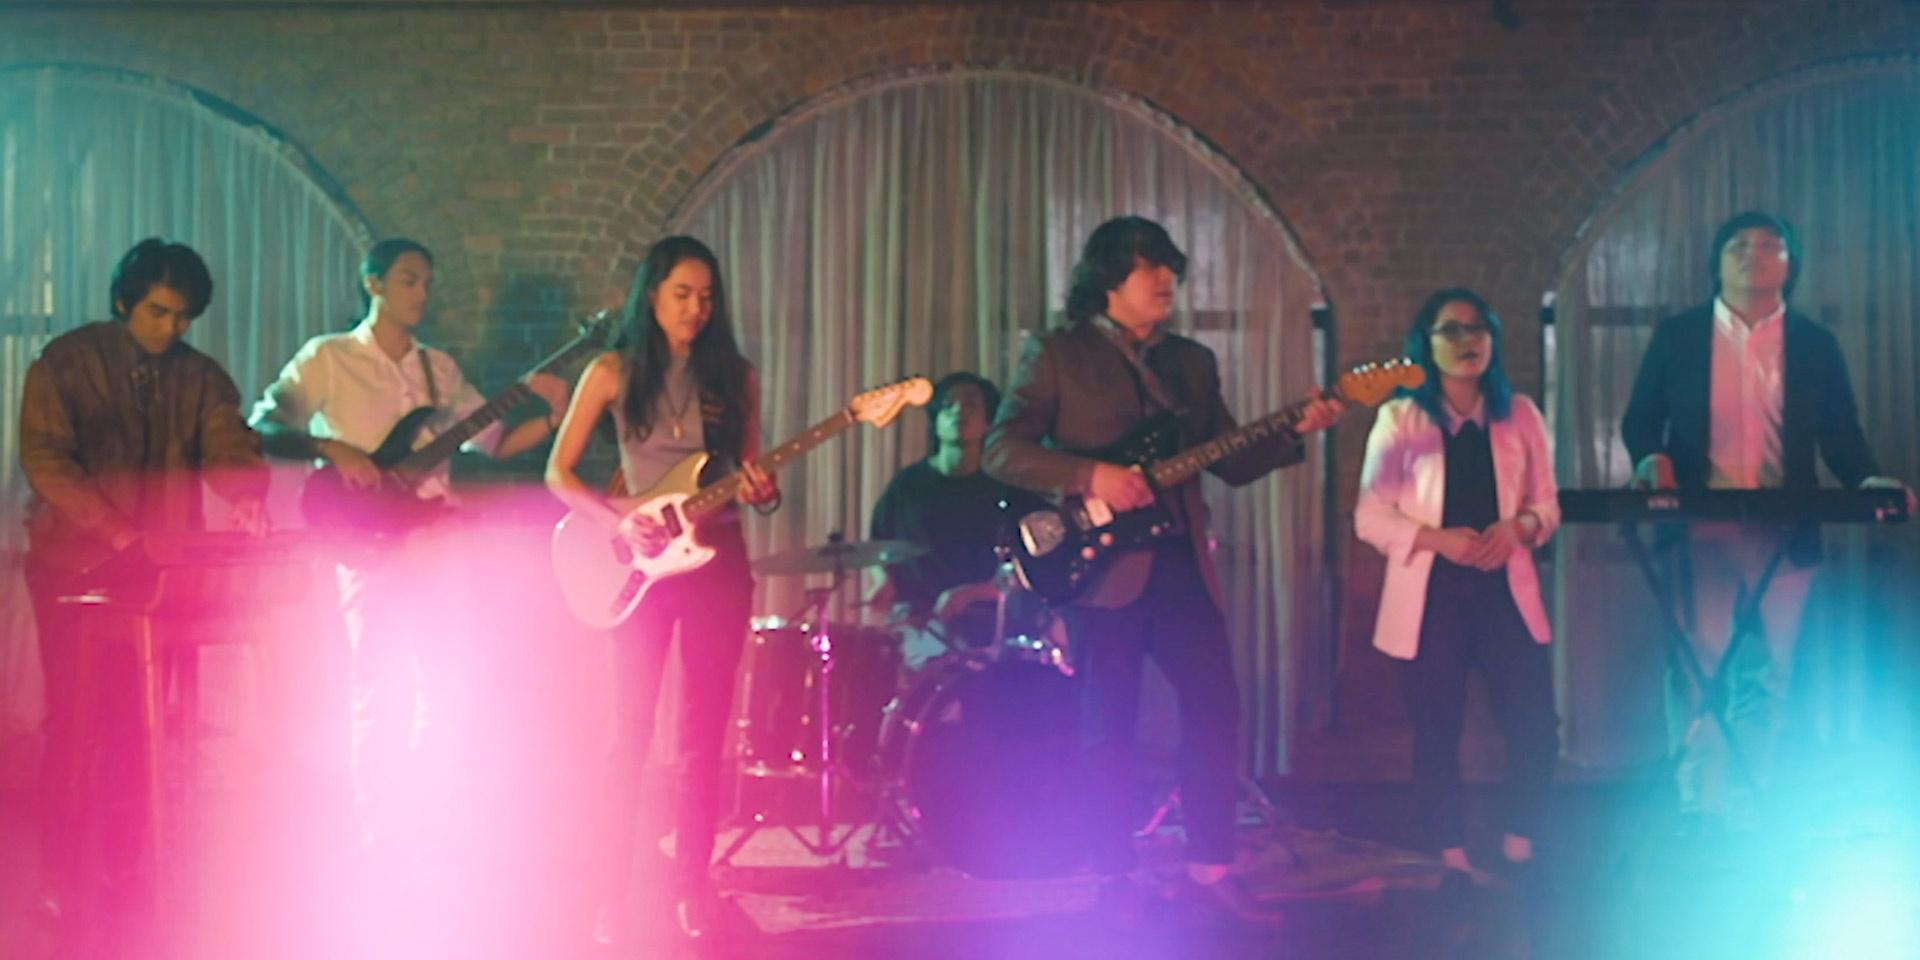 Carousel Casualties share romantic 'Always' music video – watch